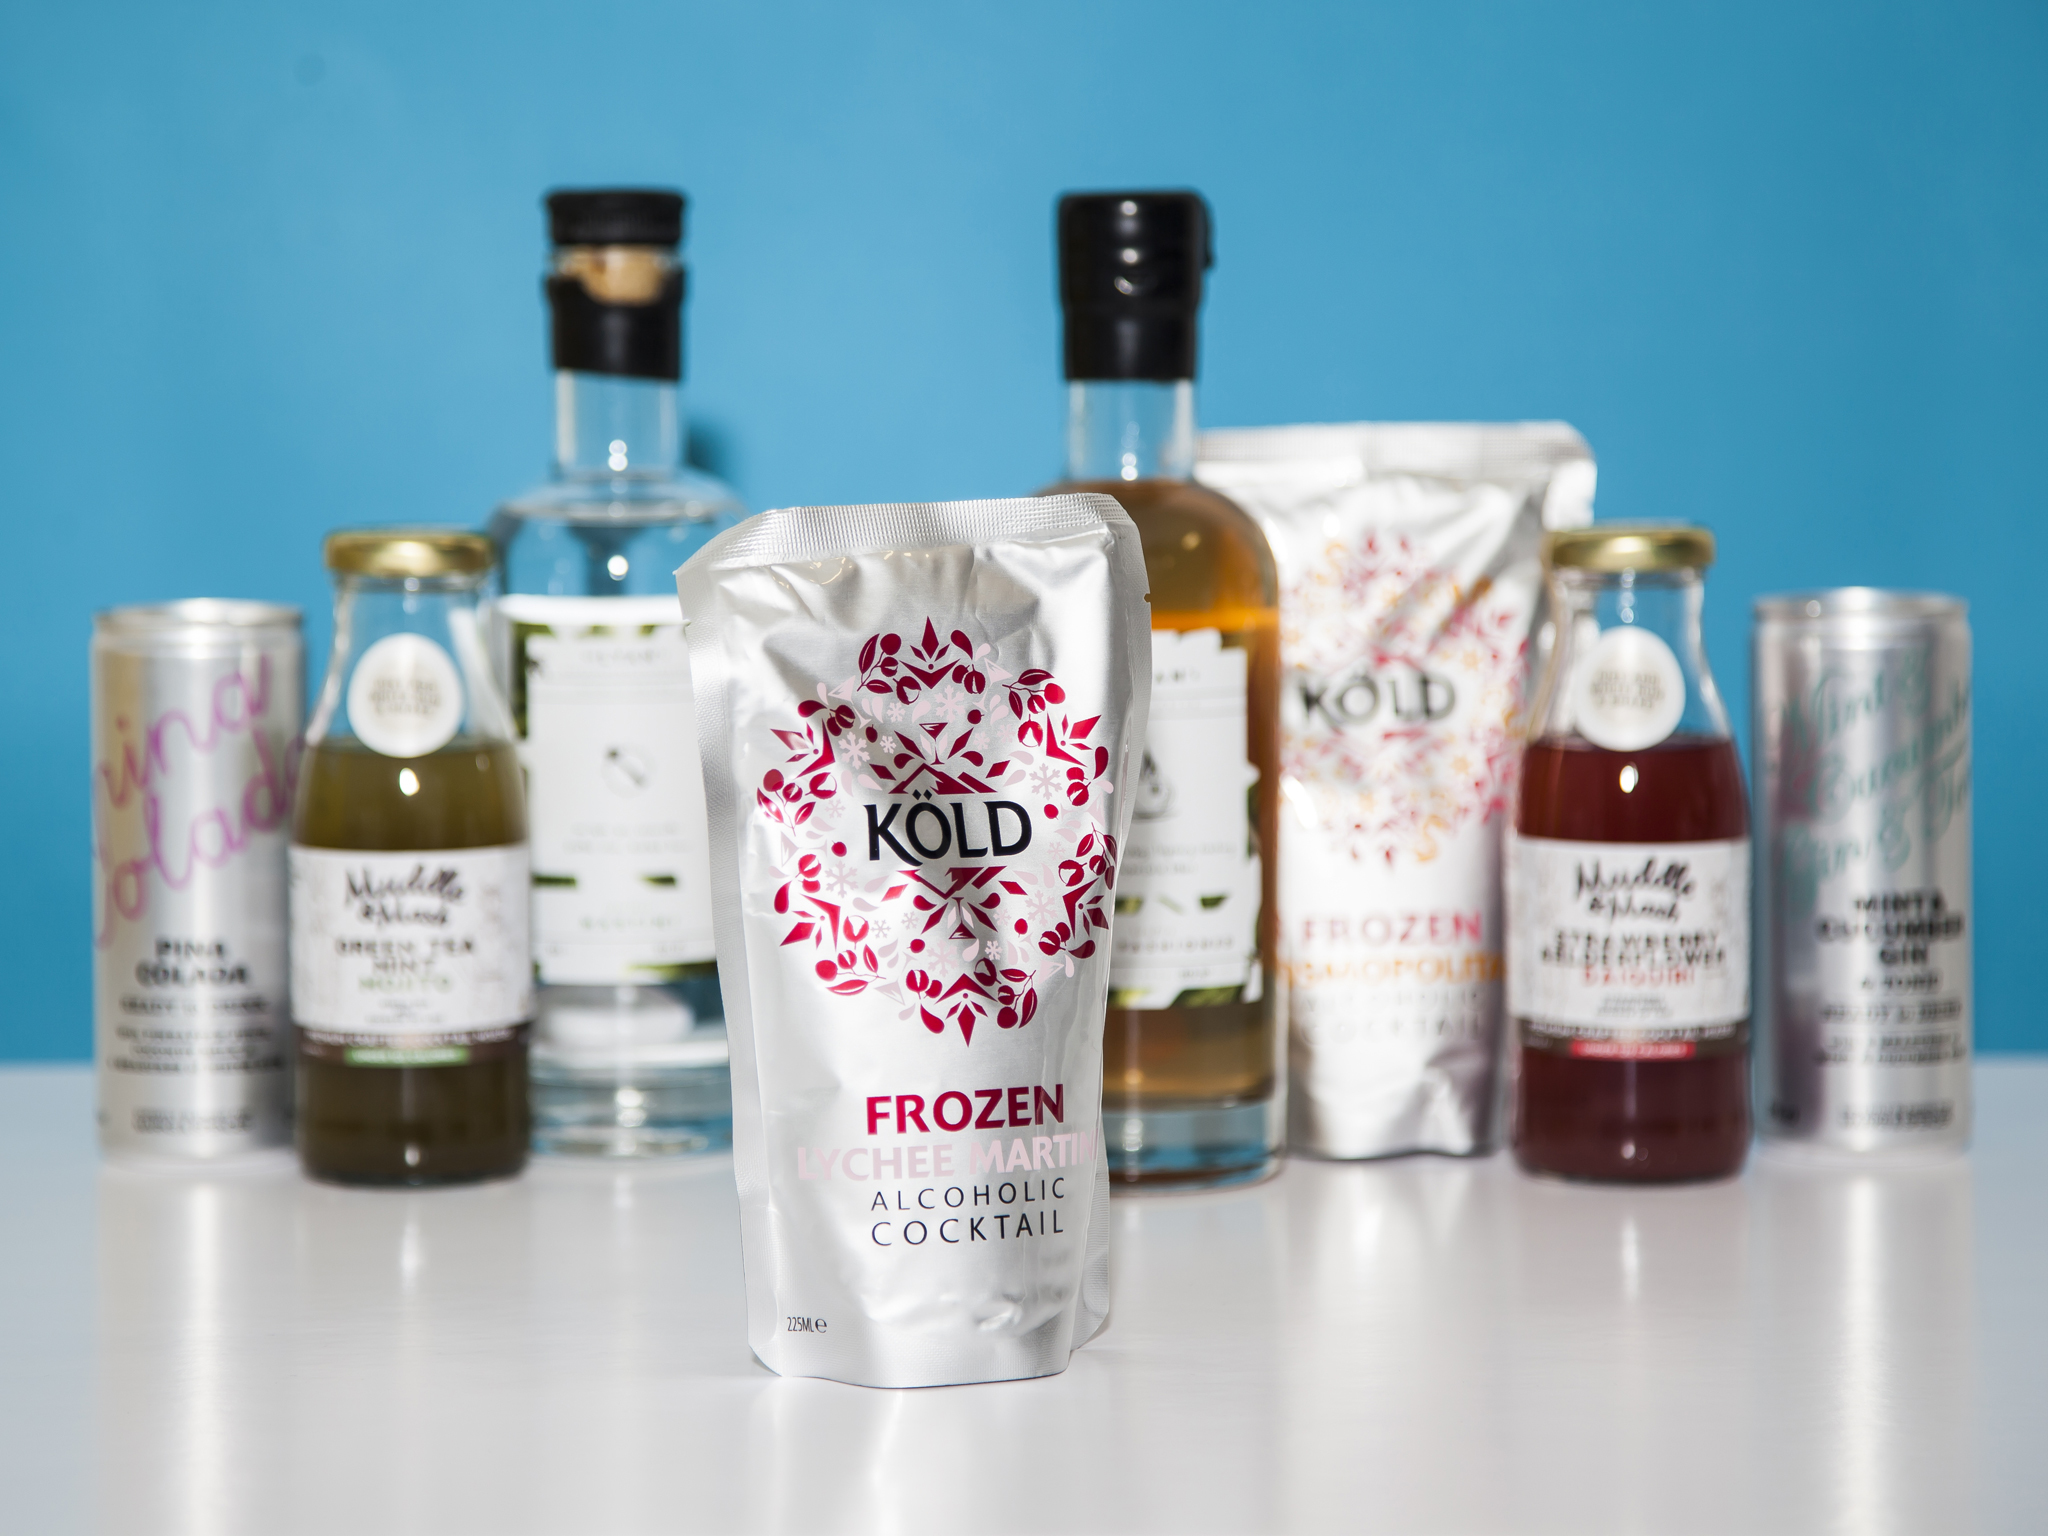 best pre-mixed cocktails, Kold frozen lychee marini